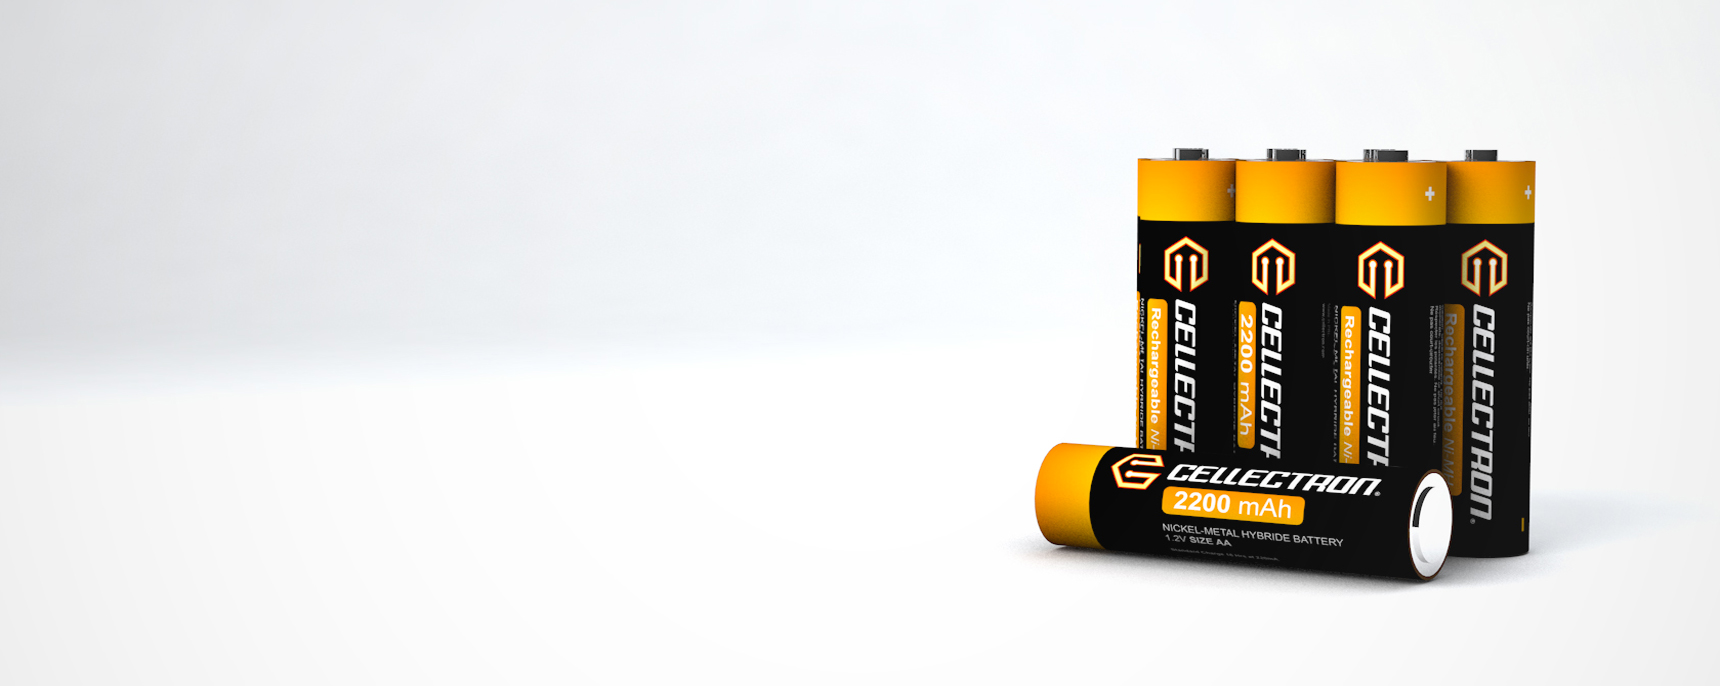 Batteries AASatisfaction guaranteed